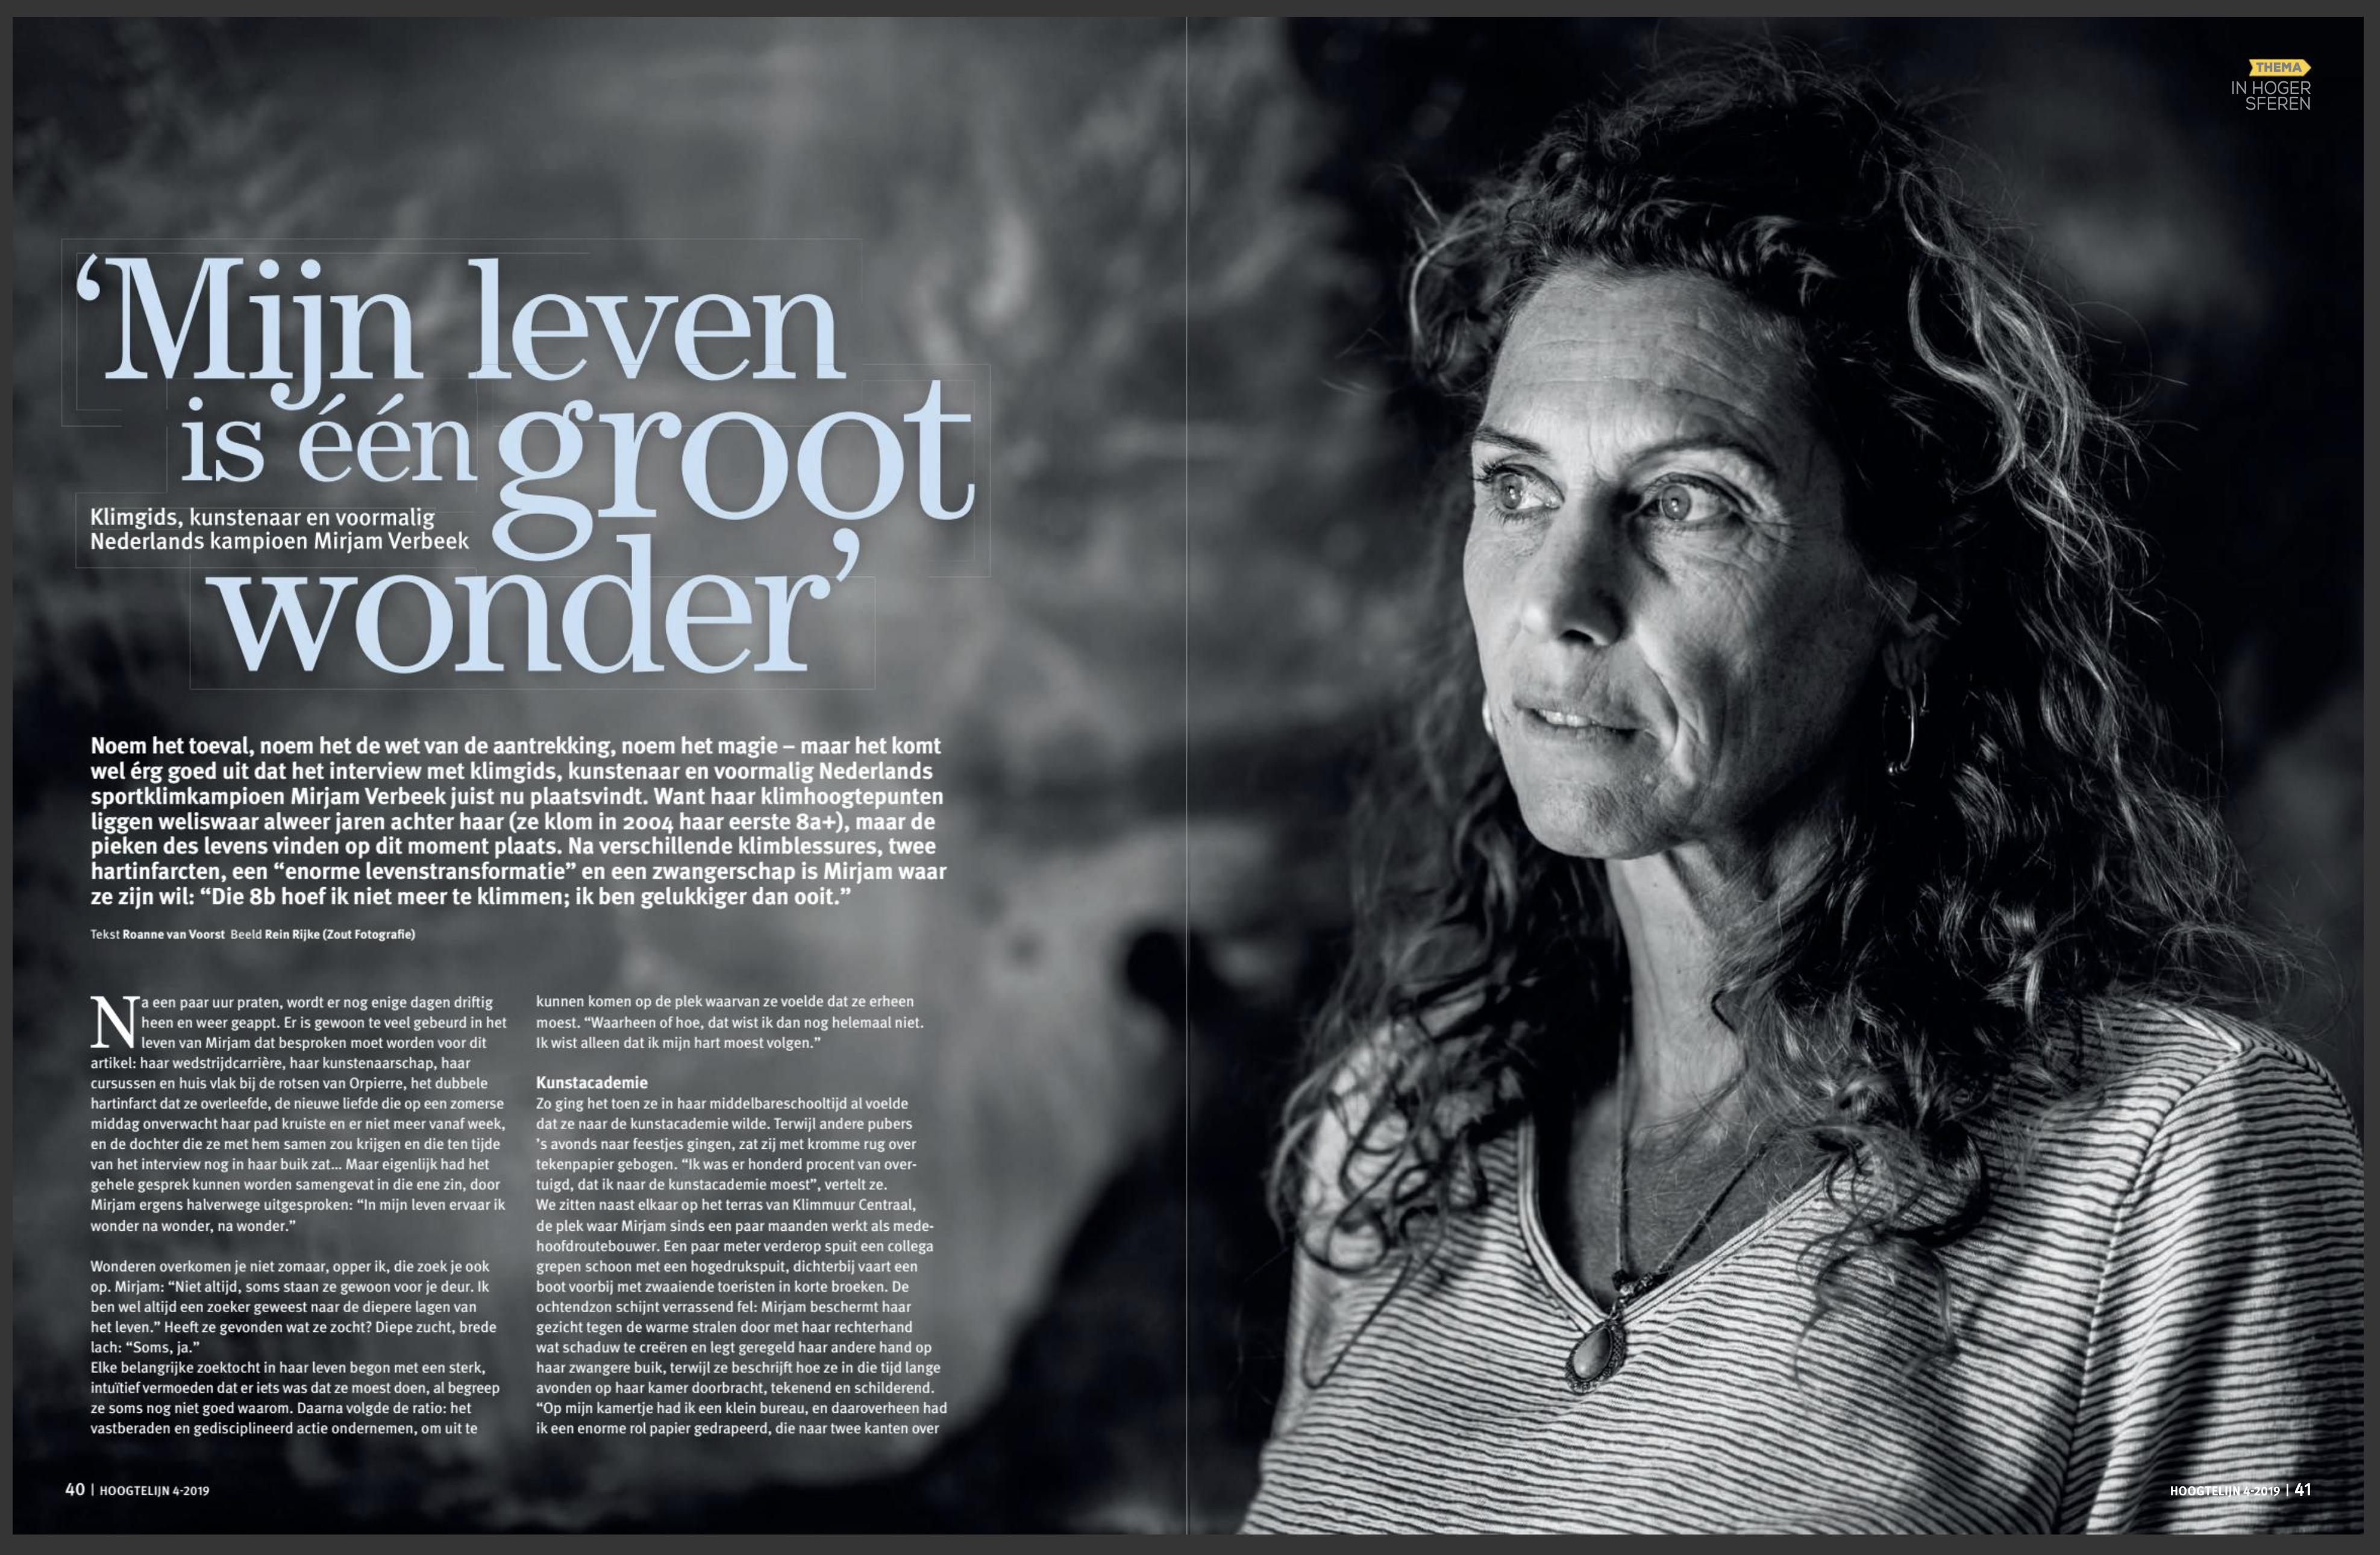 Portret fotografie Mirjam Verbeek